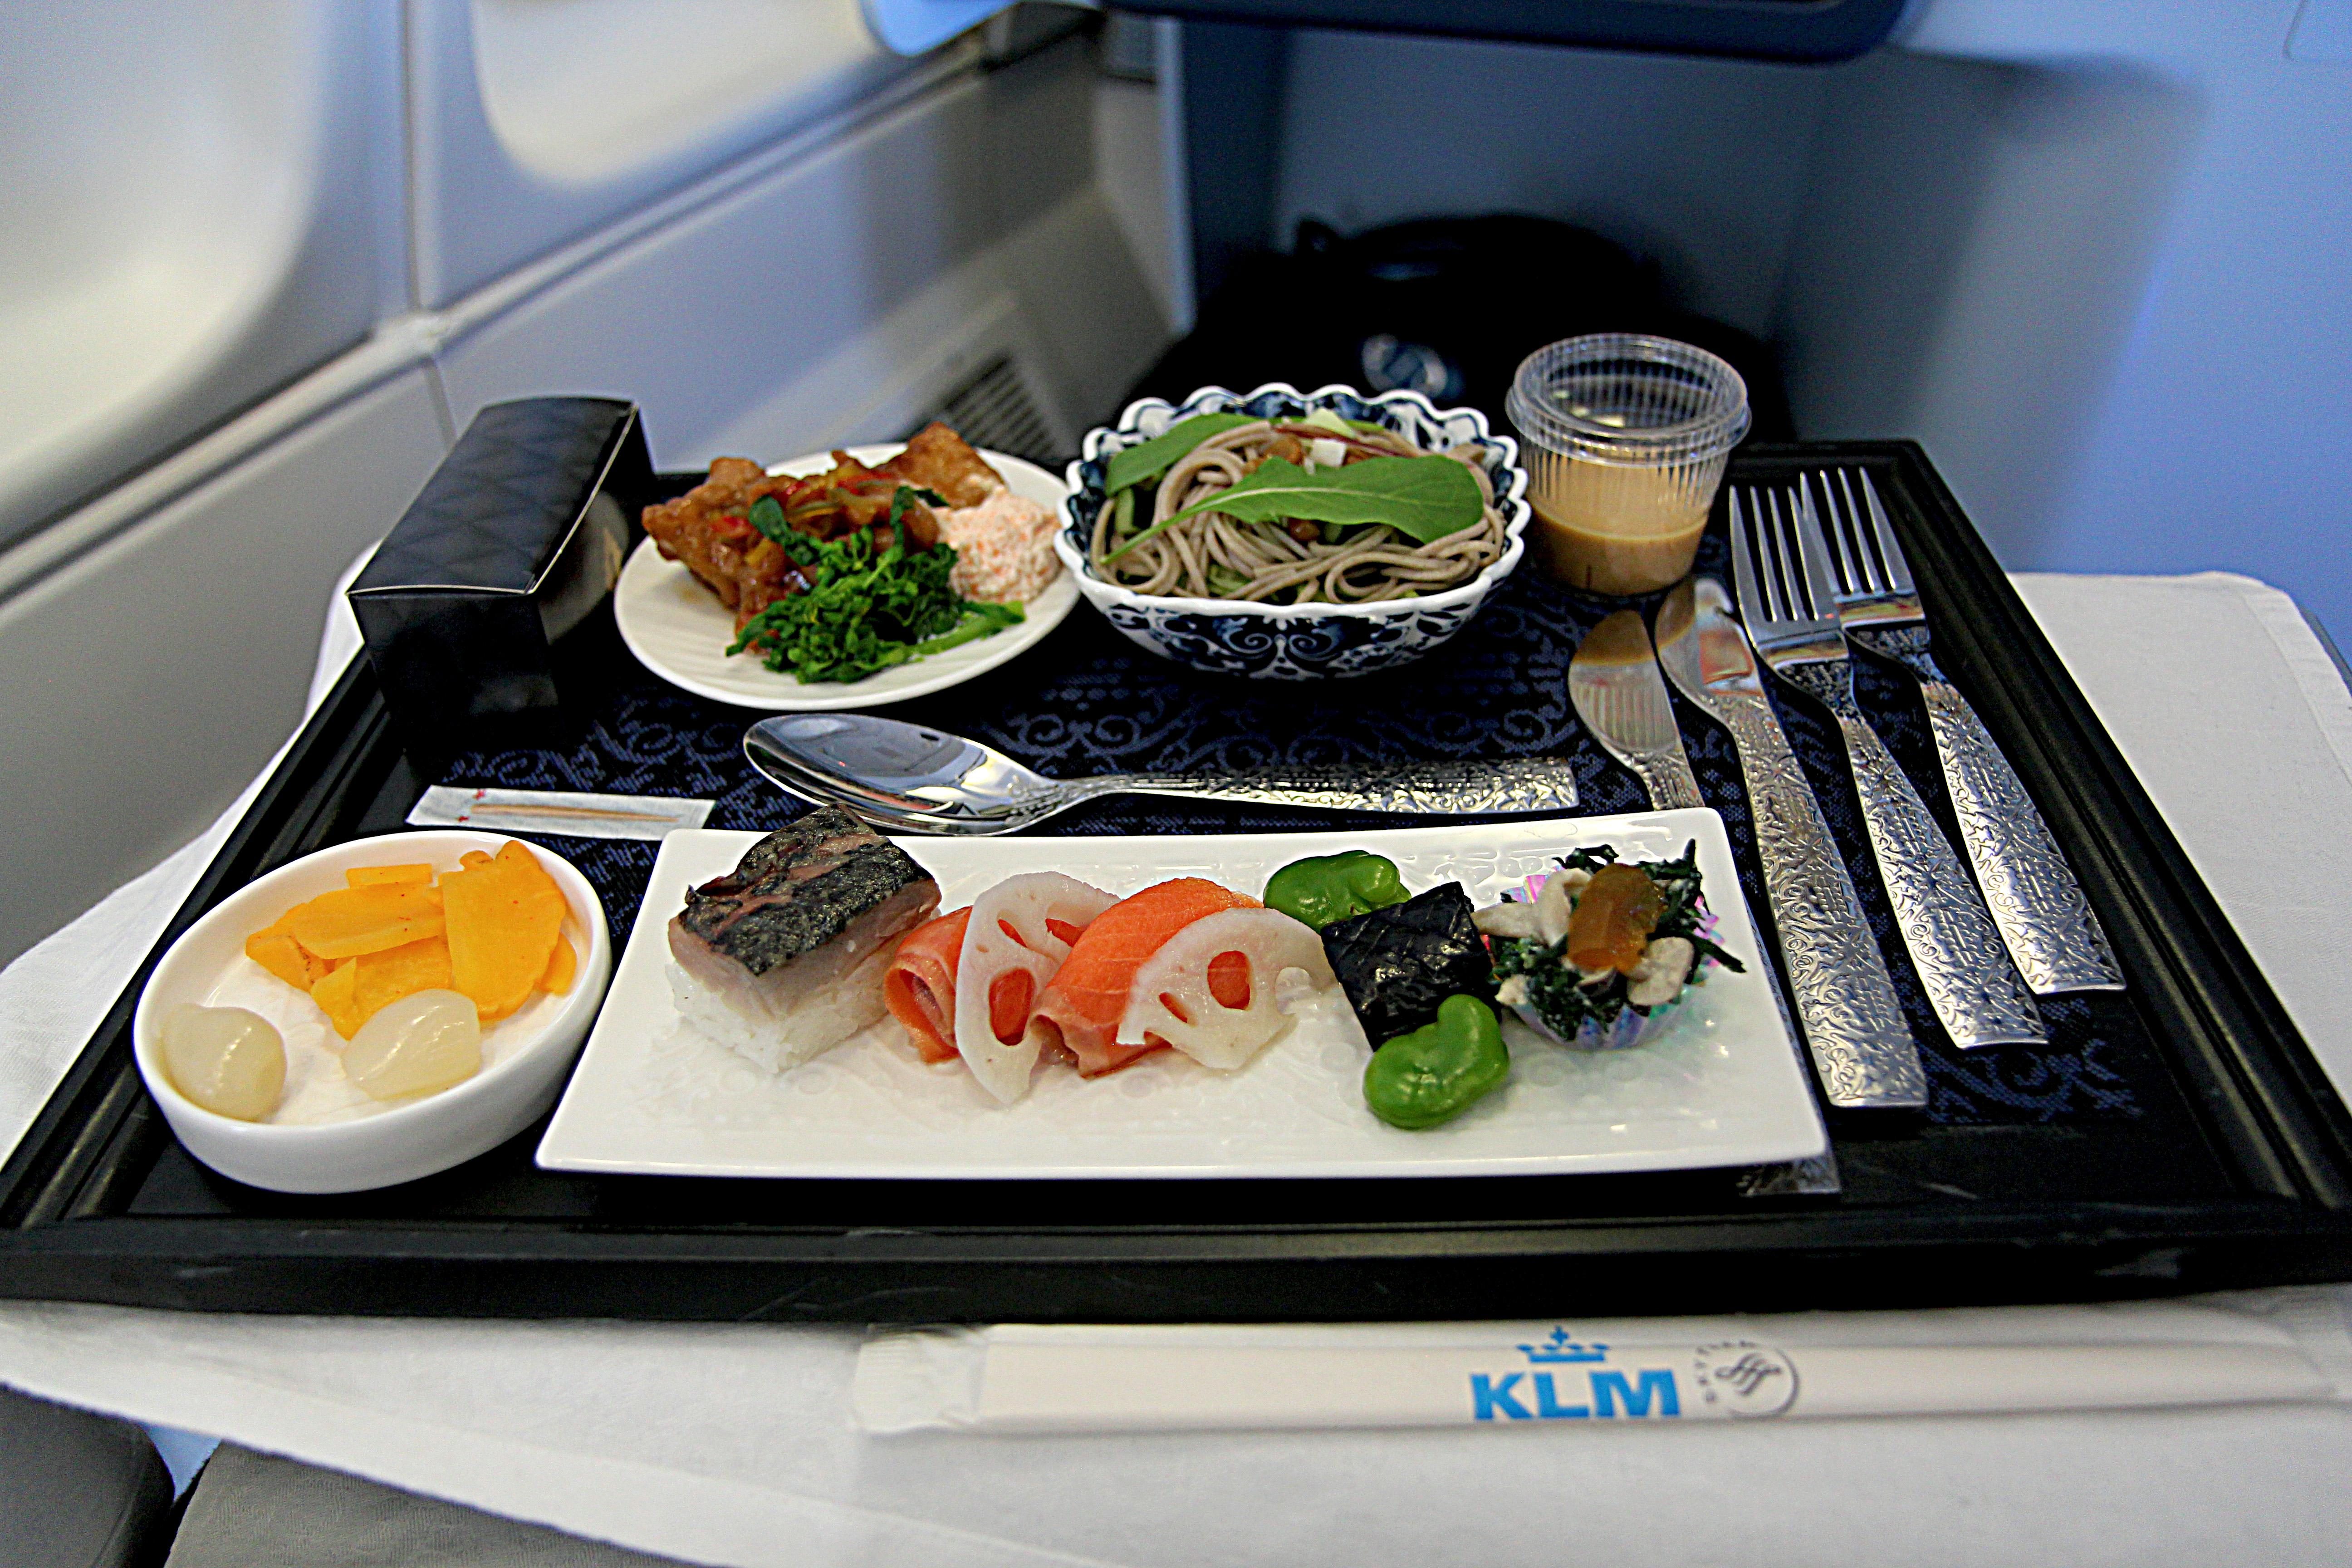 KLM 3